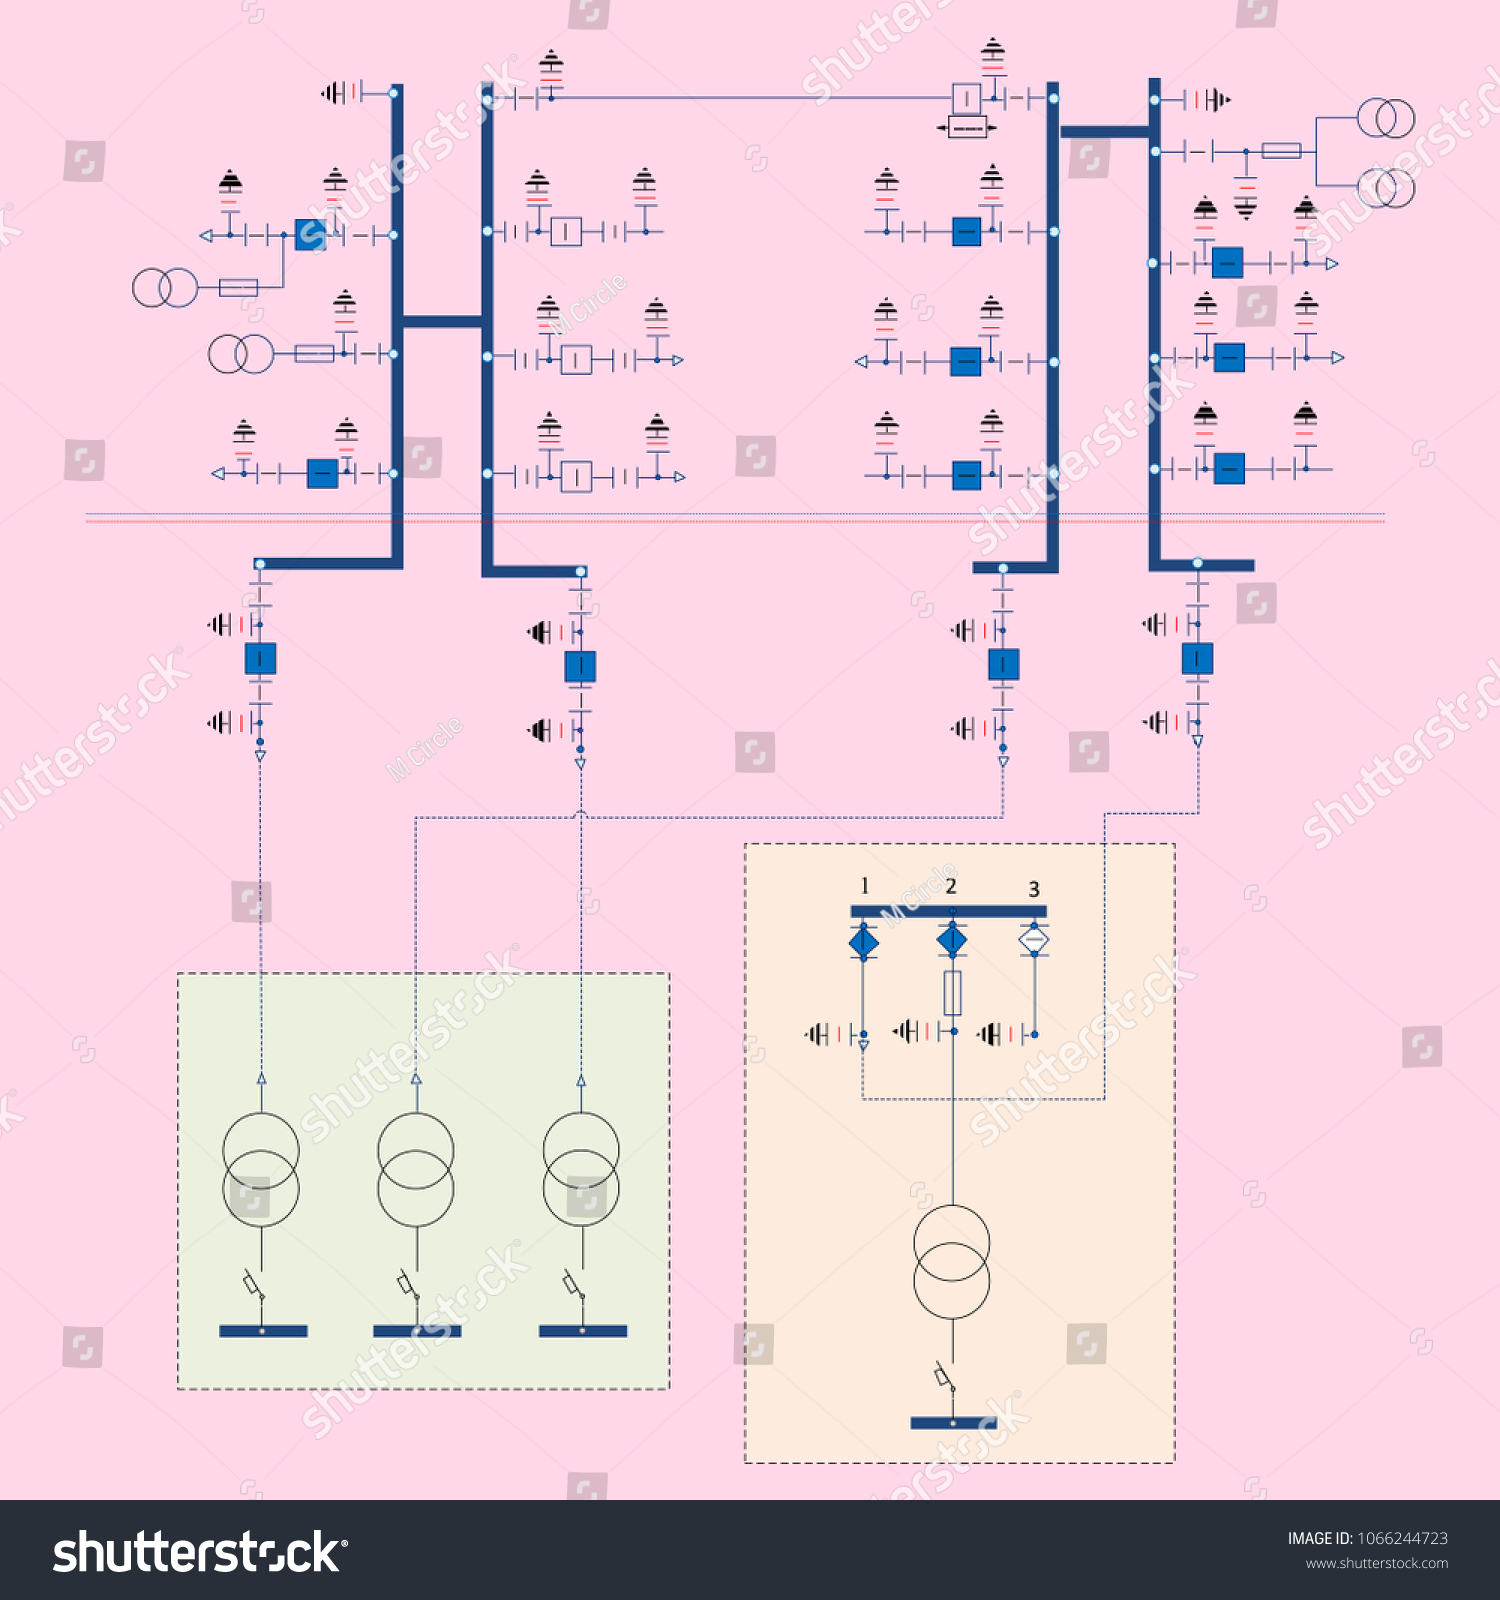 H Ih Wiring Diagram on ih h tractor, mf 175 wiring diagram, ih h oil pump, jd a wiring diagram, ac 170 wiring diagram,